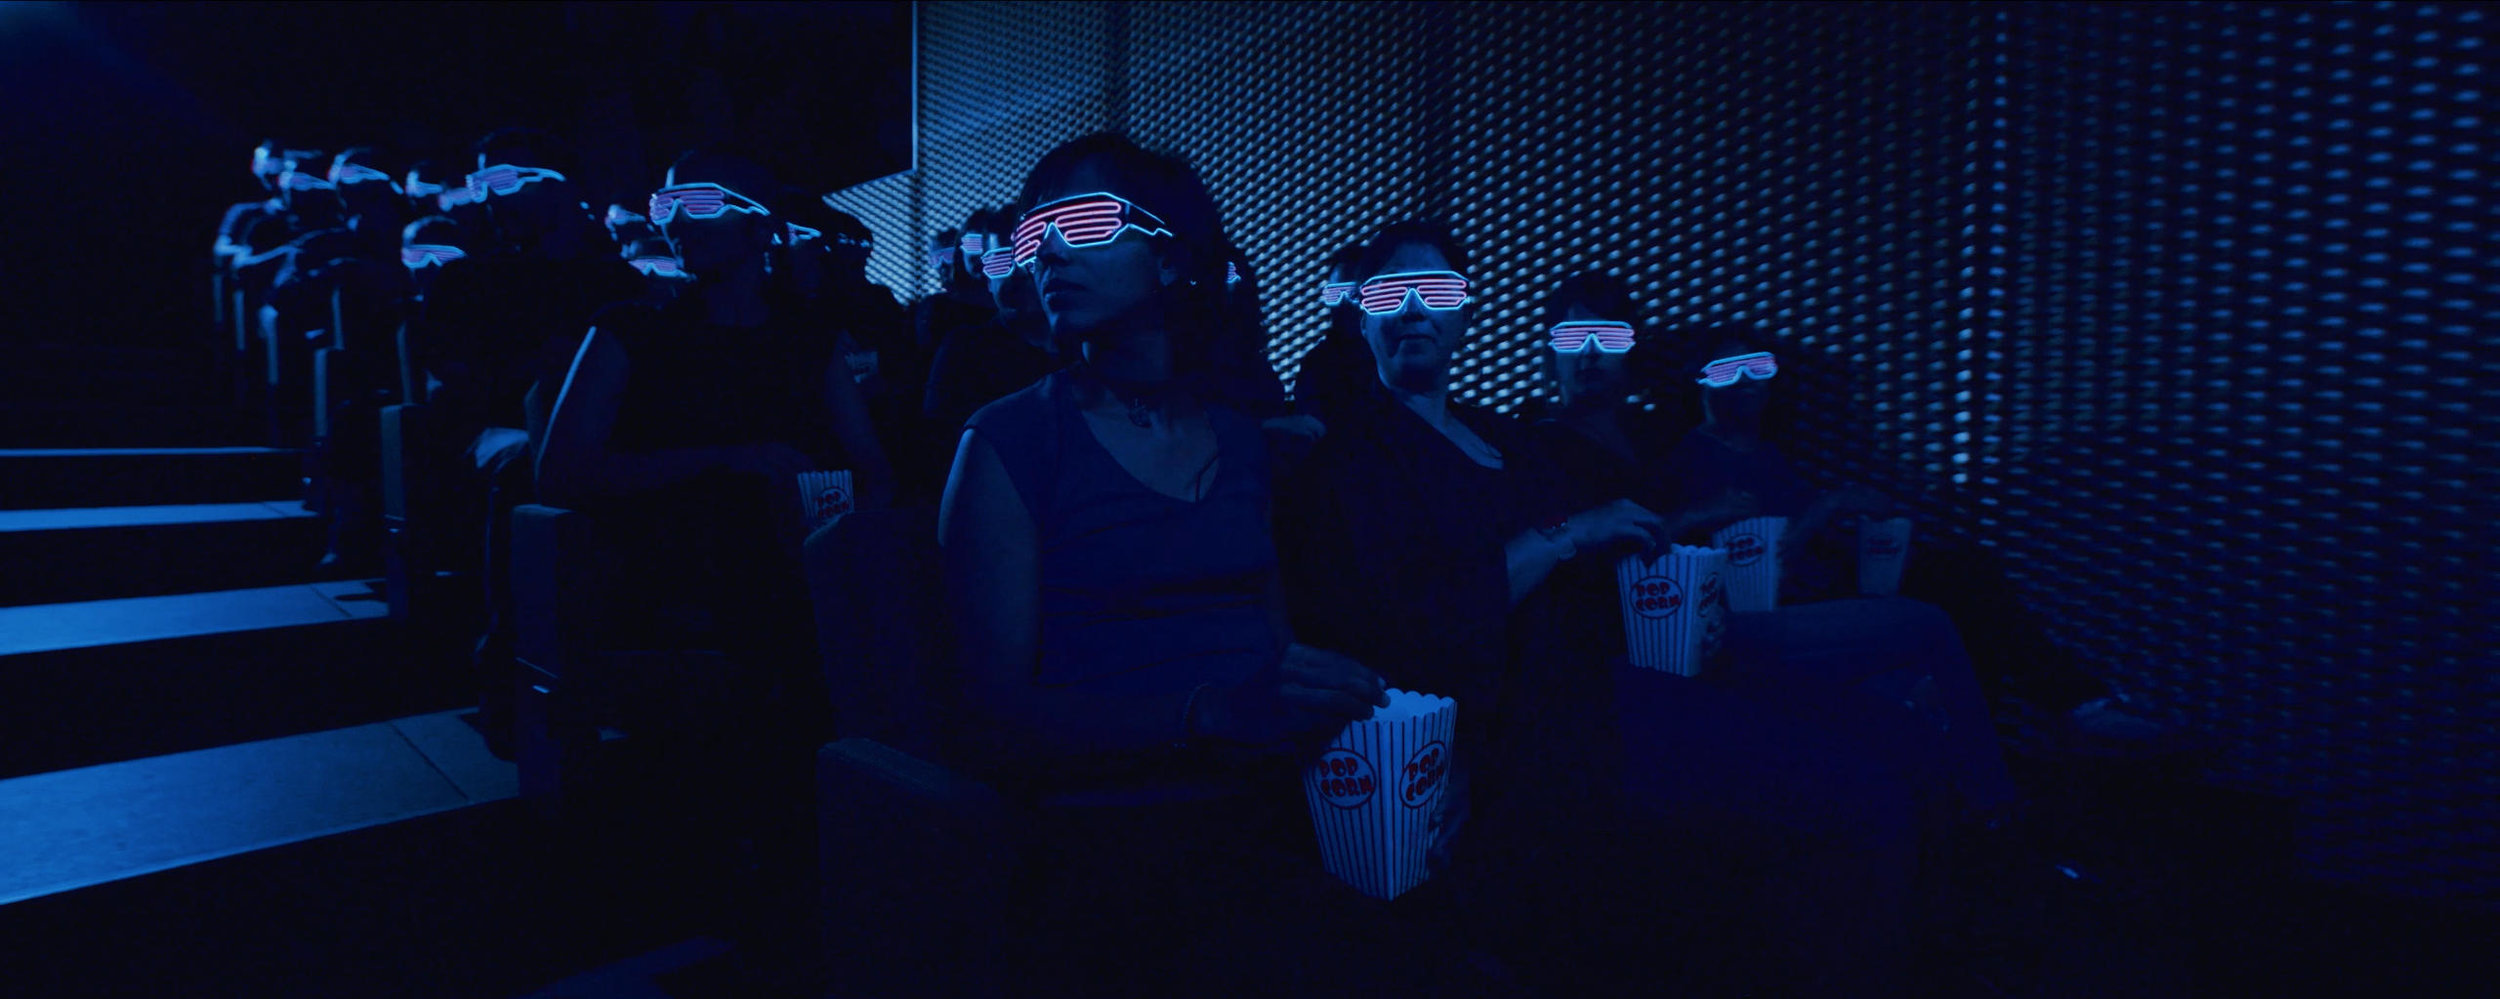 Auditorio LED.jpg